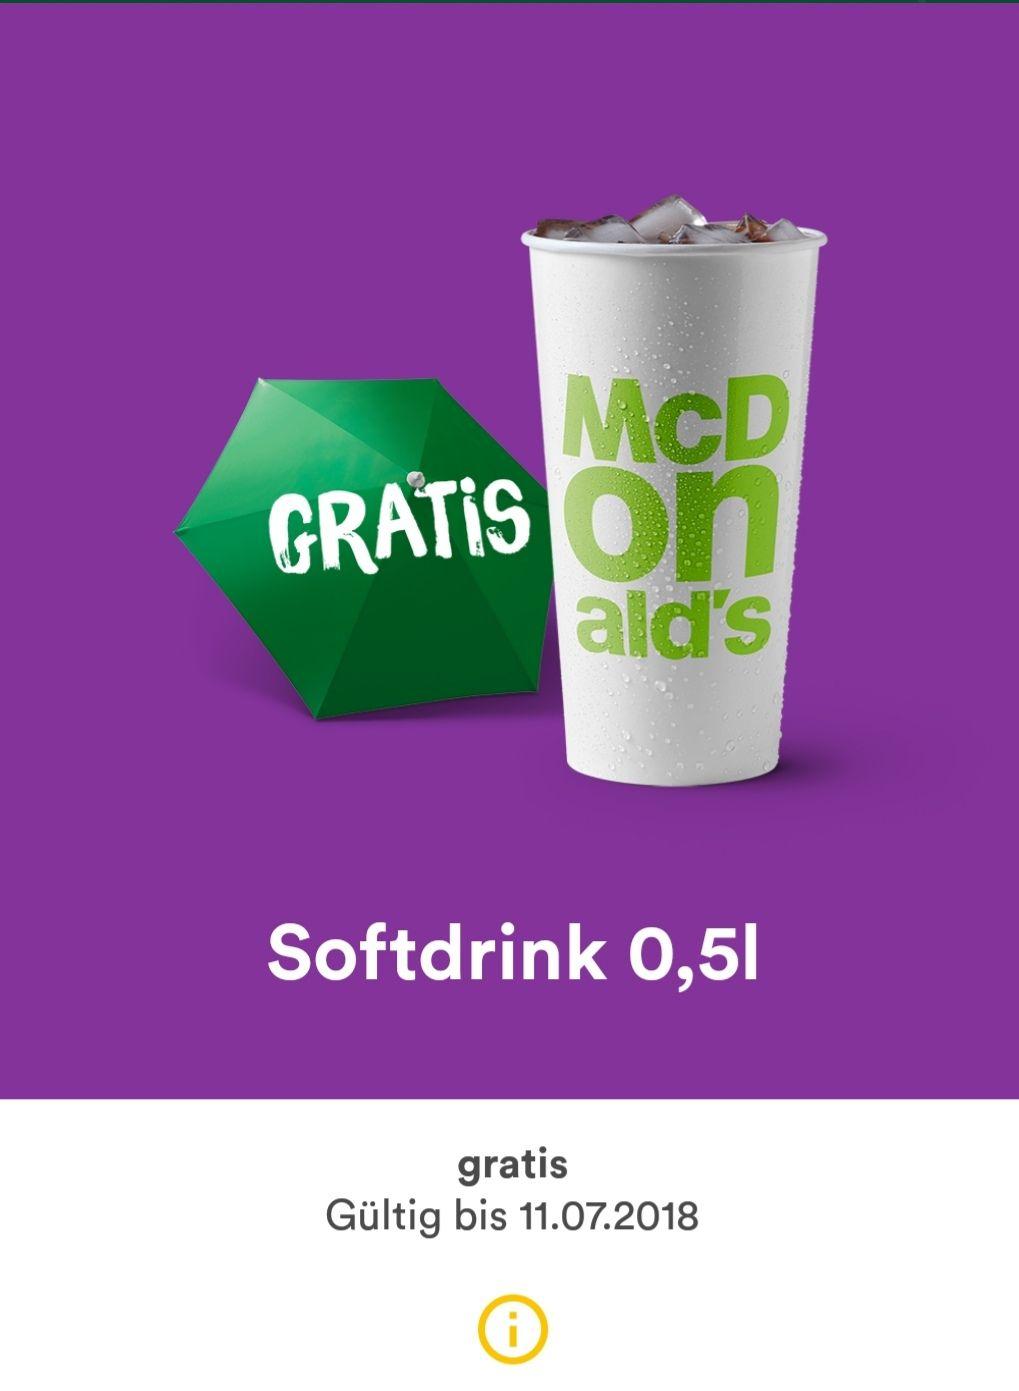 MyMcdonald's App 0,5L Softdrink gratis